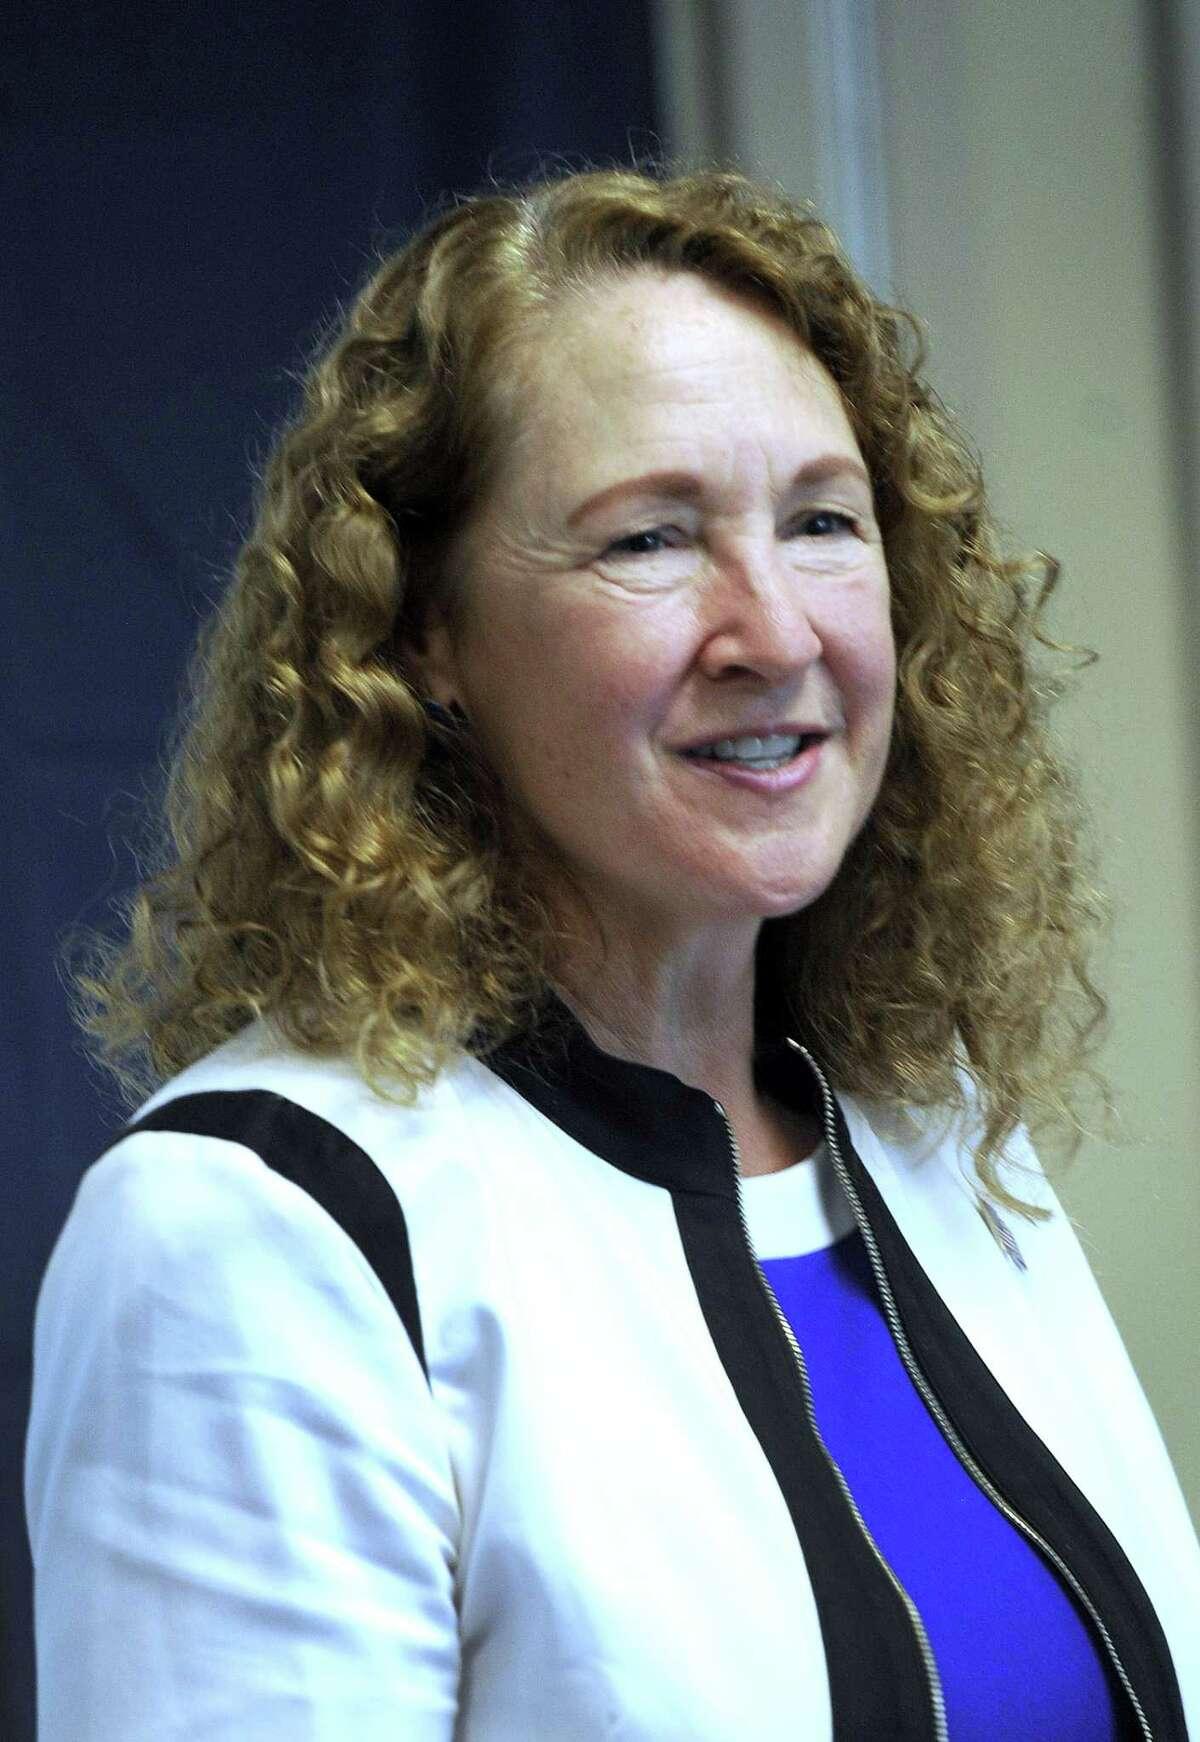 Former U.S. Rep. Elizabeth Esty in Brookfield Monday, June 11, 2018.